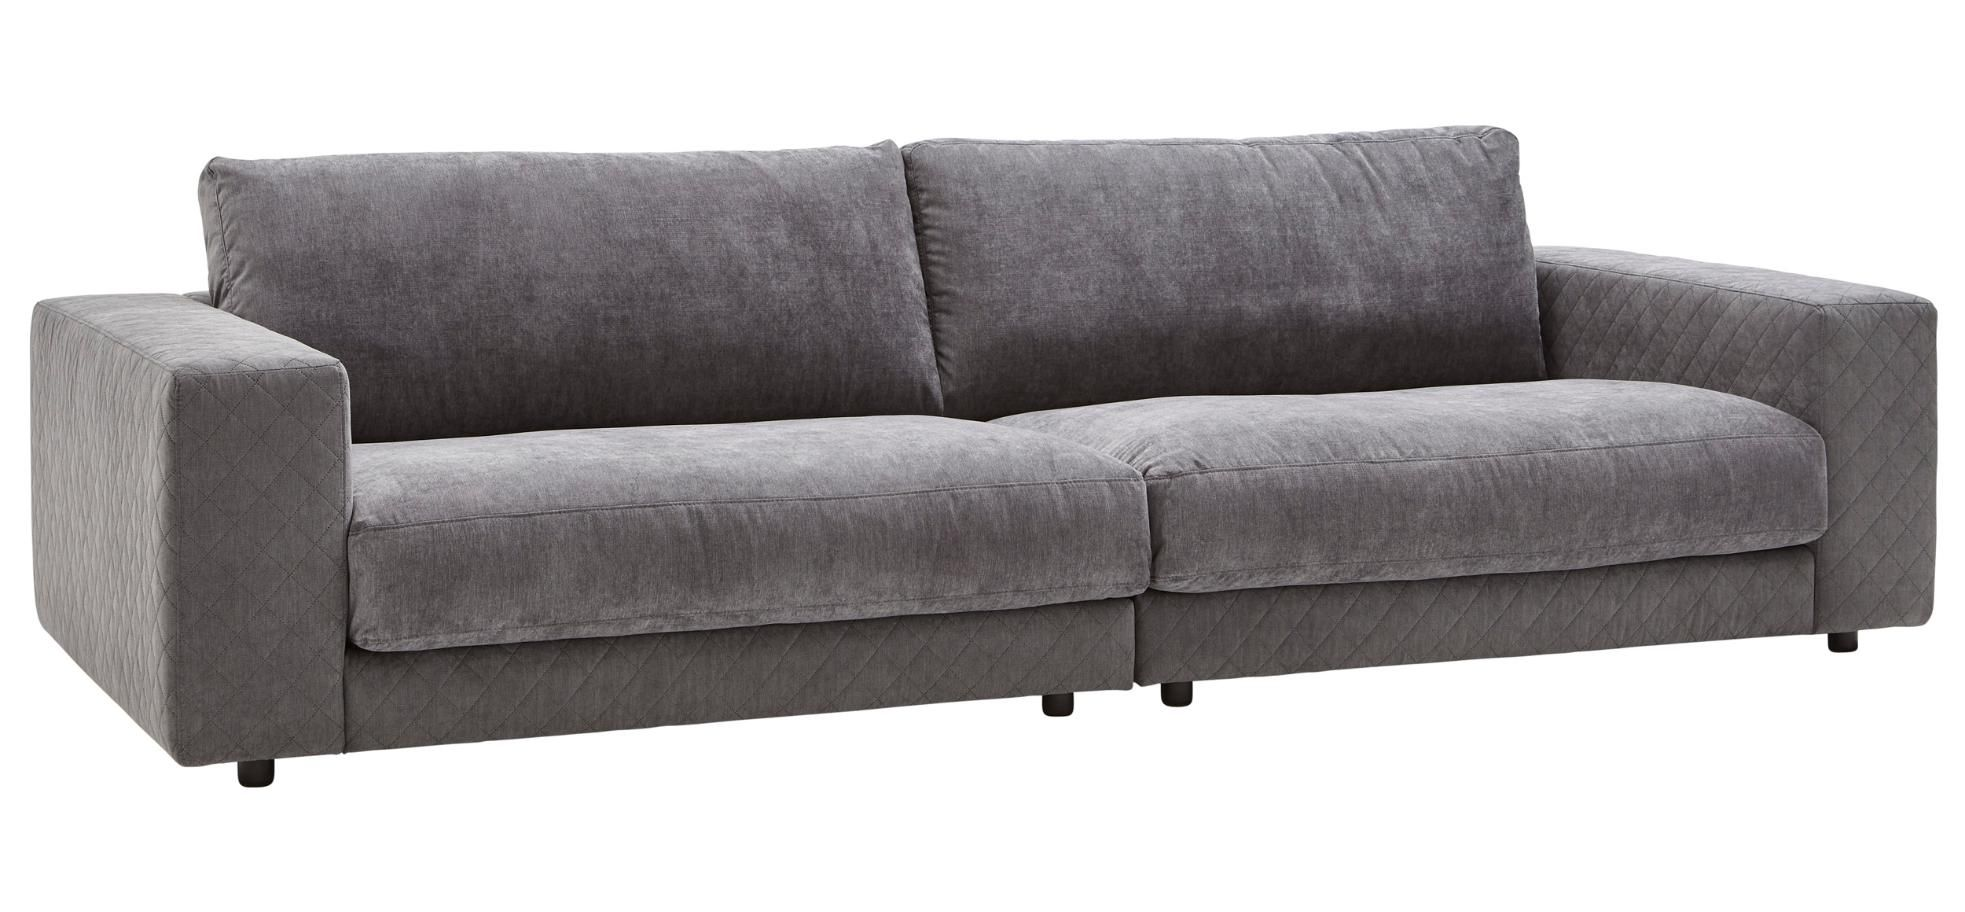 3 Sitzer Sofa Natura Pasadena Select Mit Stoffmix Berkemeier Home Company In 2020 3 Sitzer Sofa Sitzen Mobelstuck